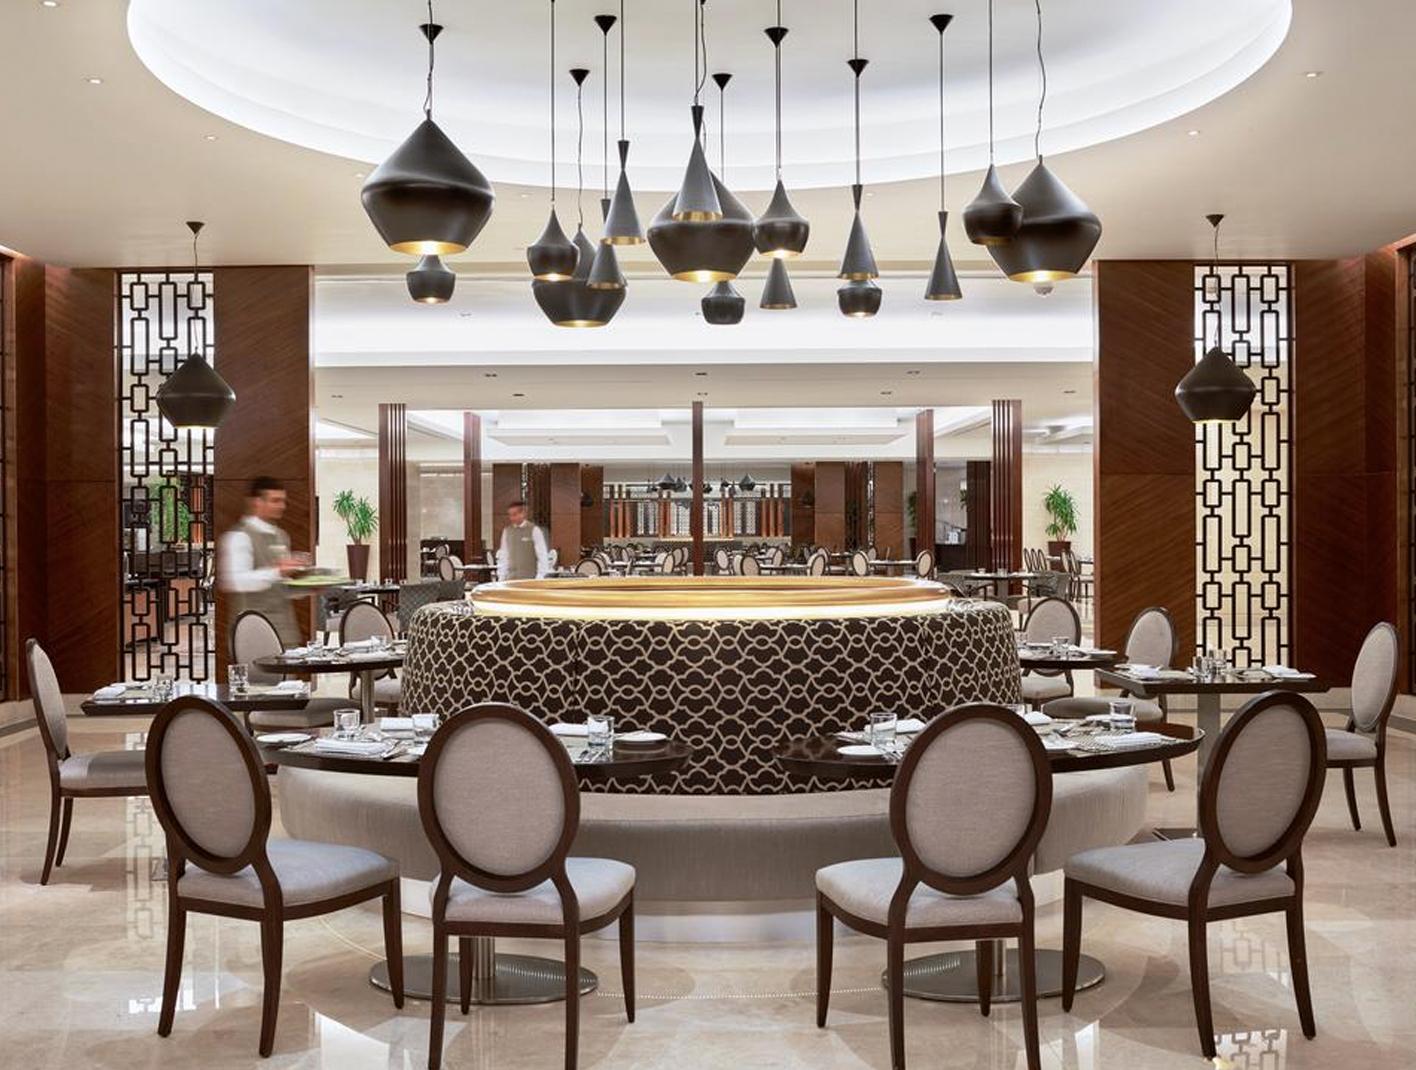 Swissotel Al Maqam Hotel - Makkah